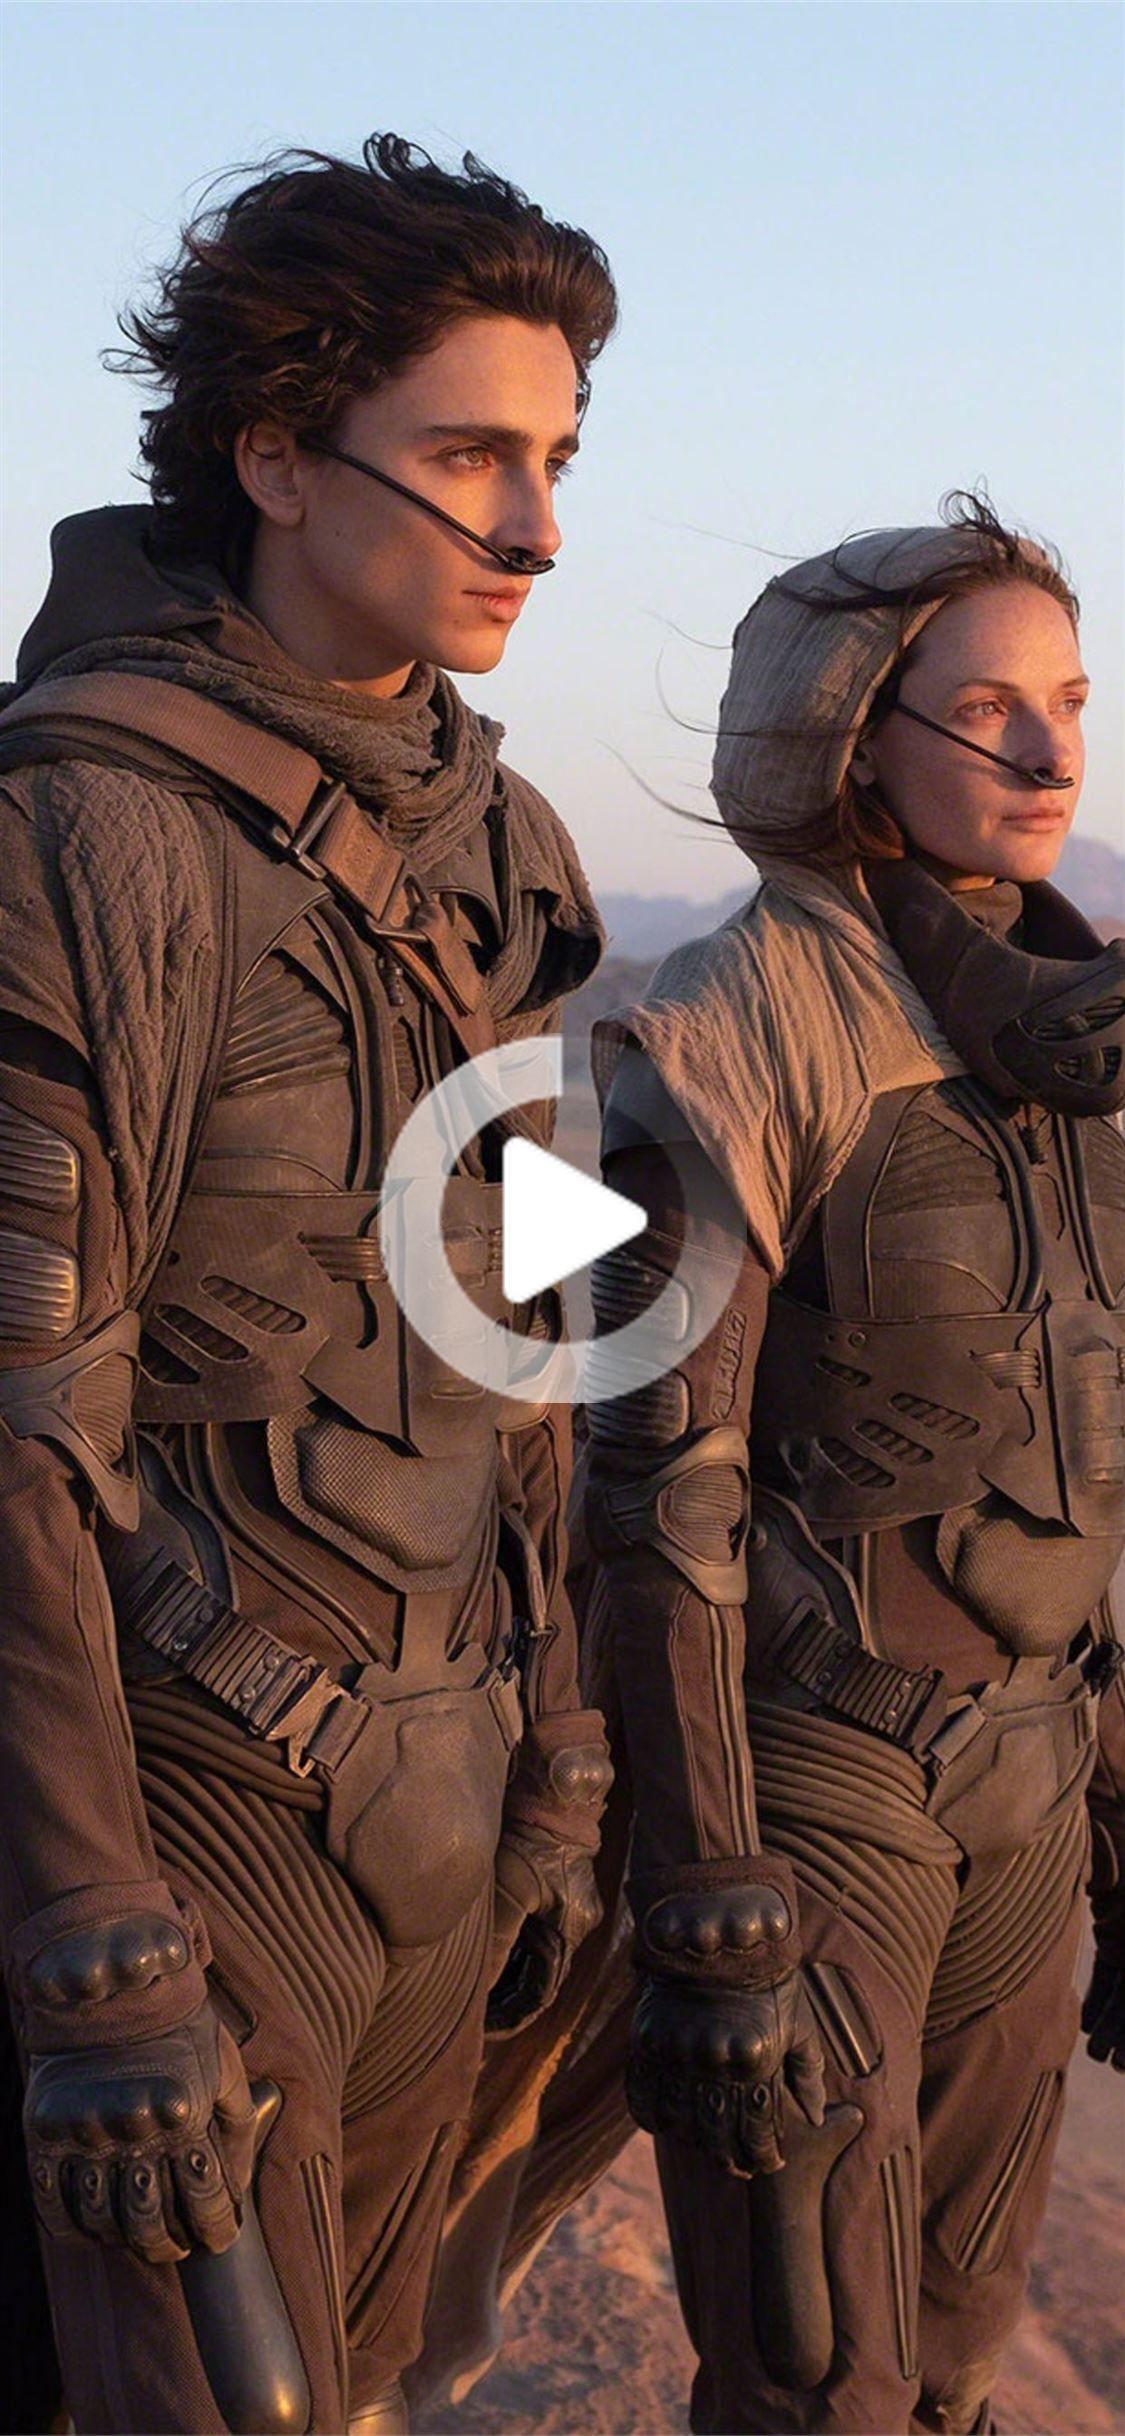 dune movie 2020 iPhone 11 Wallpapers in 2020 Live wallpaper 1125x2436